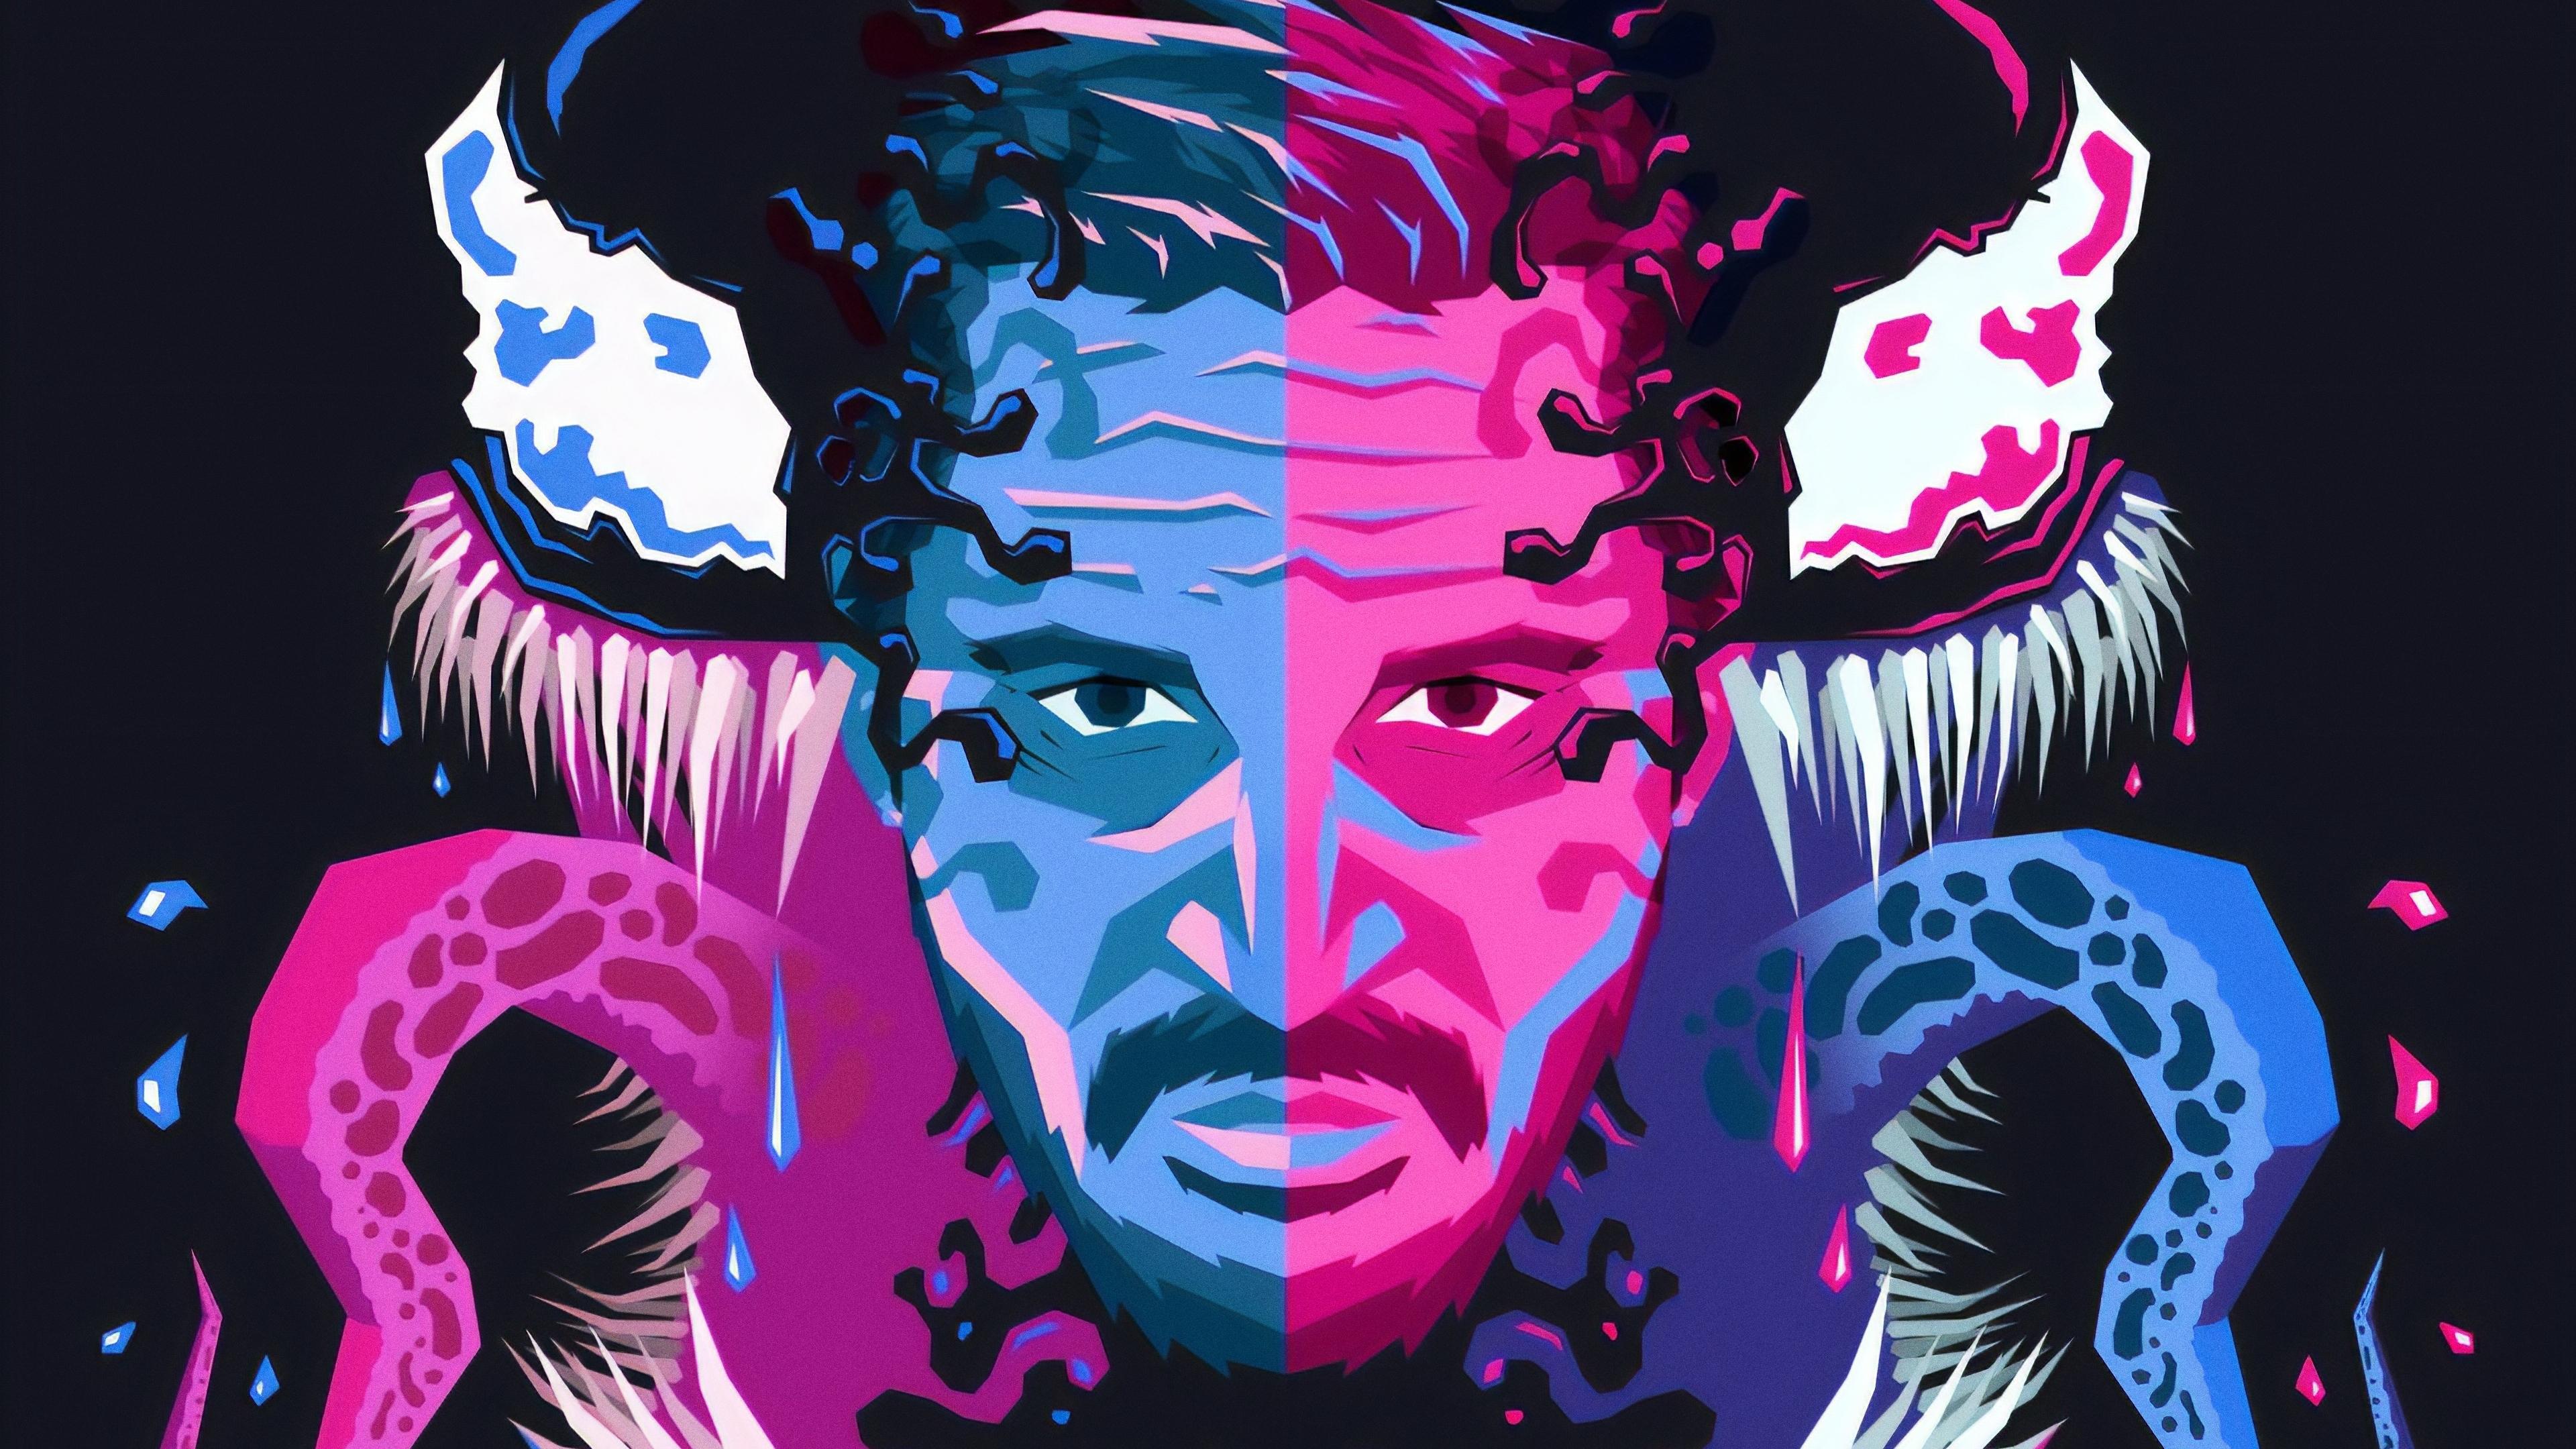 venom colorful art 1543620147 - Venom Colorful Art - Venom wallpapers, supervillain wallpapers, superheroes wallpapers, hd-wallpapers, digital art wallpapers, artwork wallpapers, 4k-wallpapers